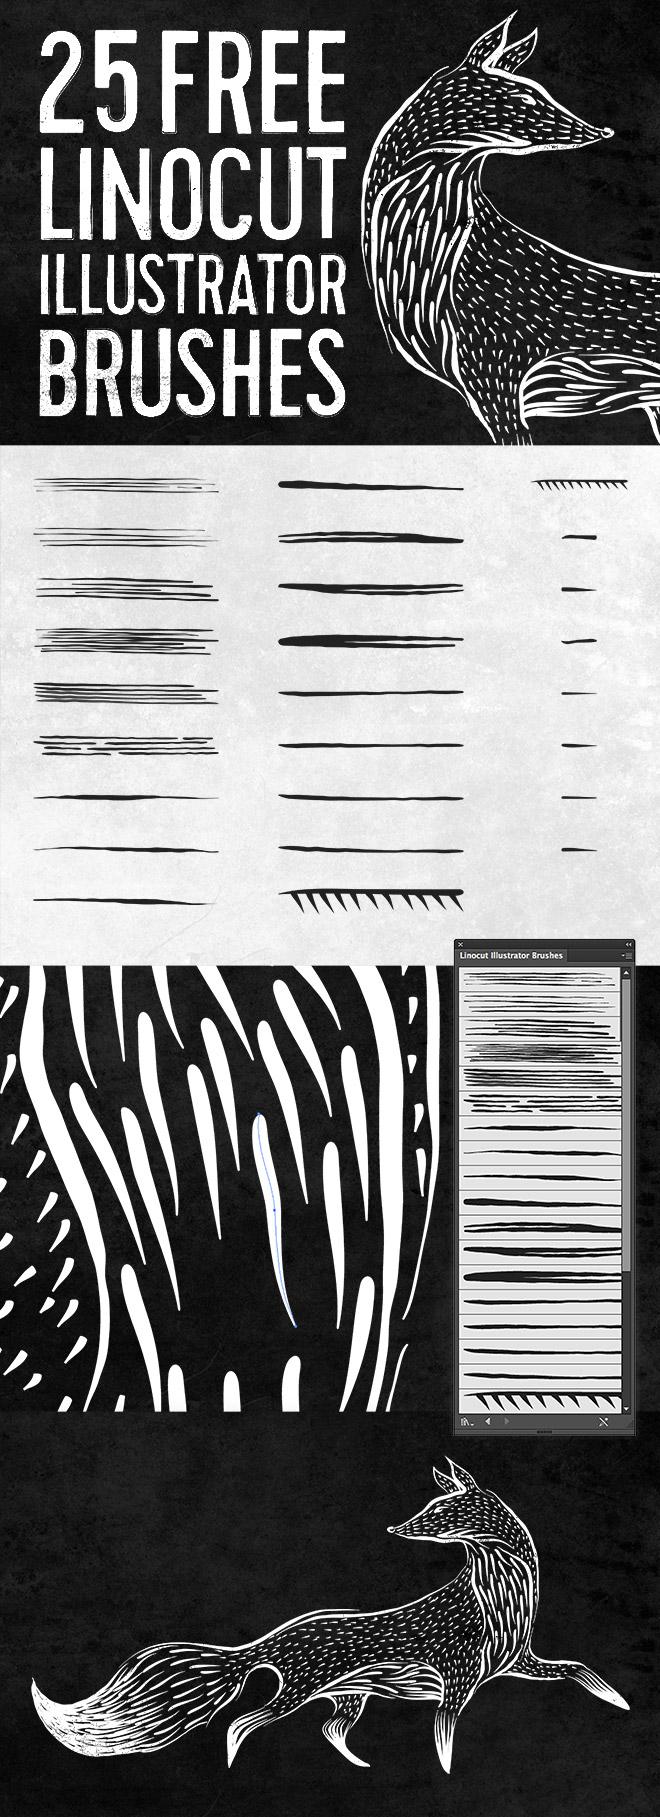 linocut-illustrator-brushes